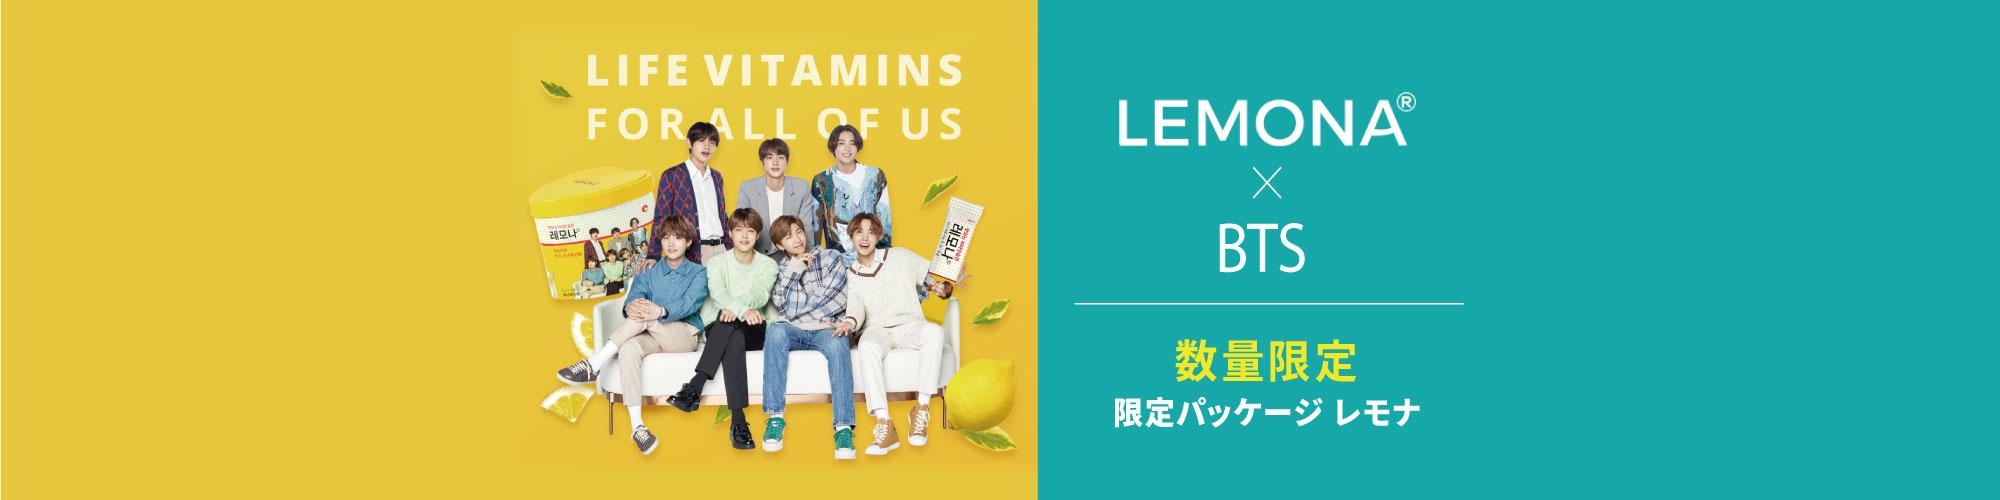 LEMONA BTS限定パッケージ